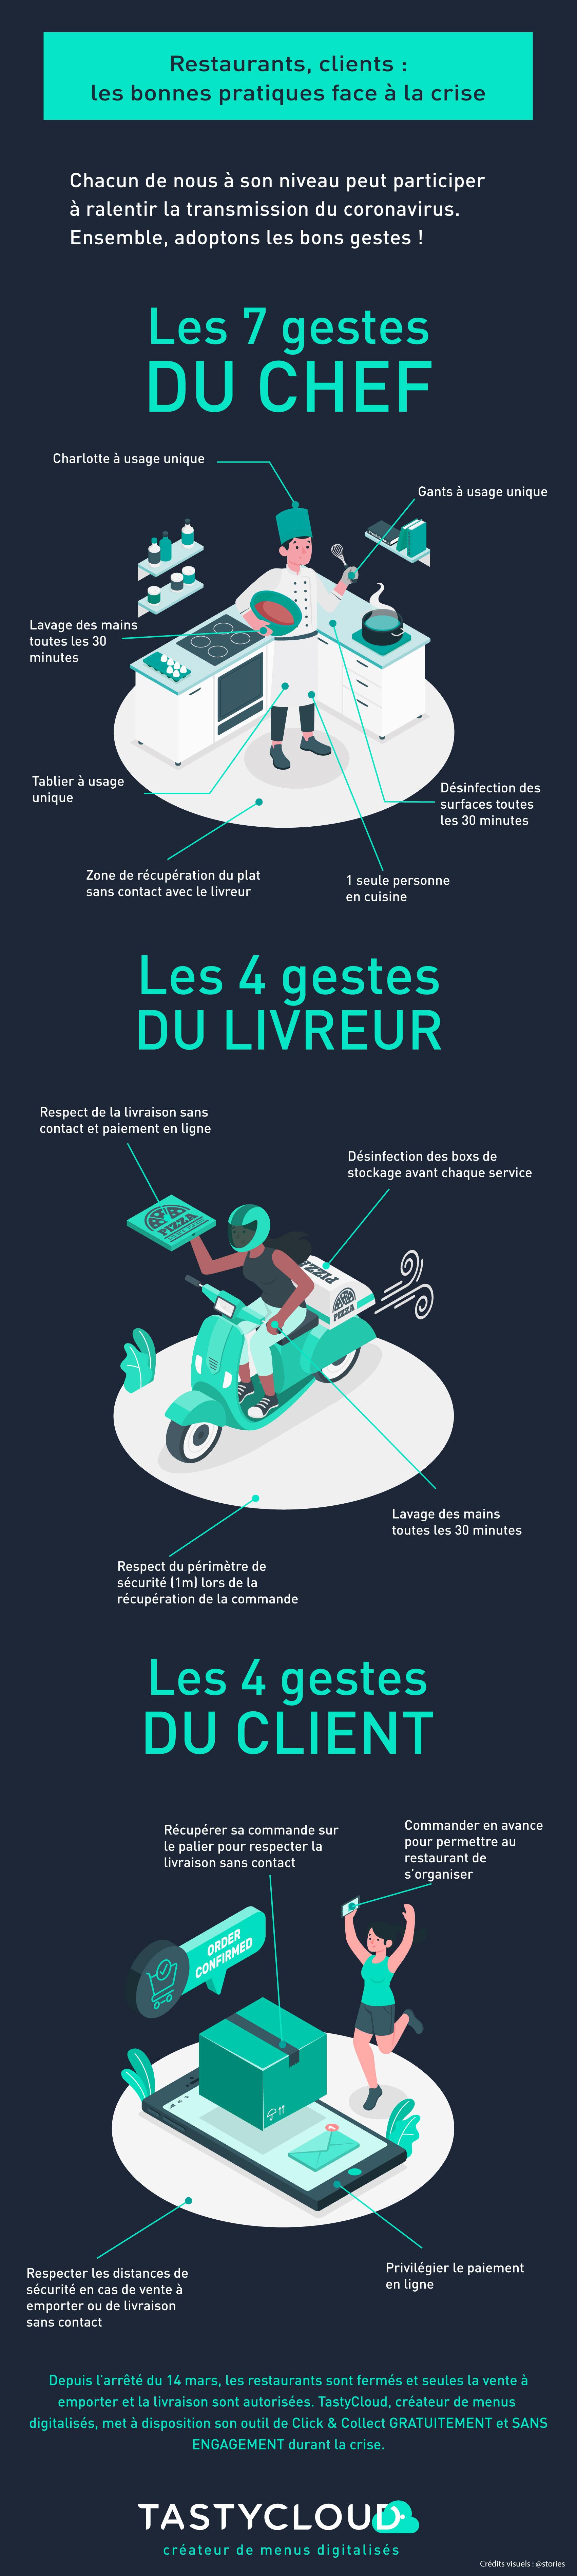 infographie-chef-v4